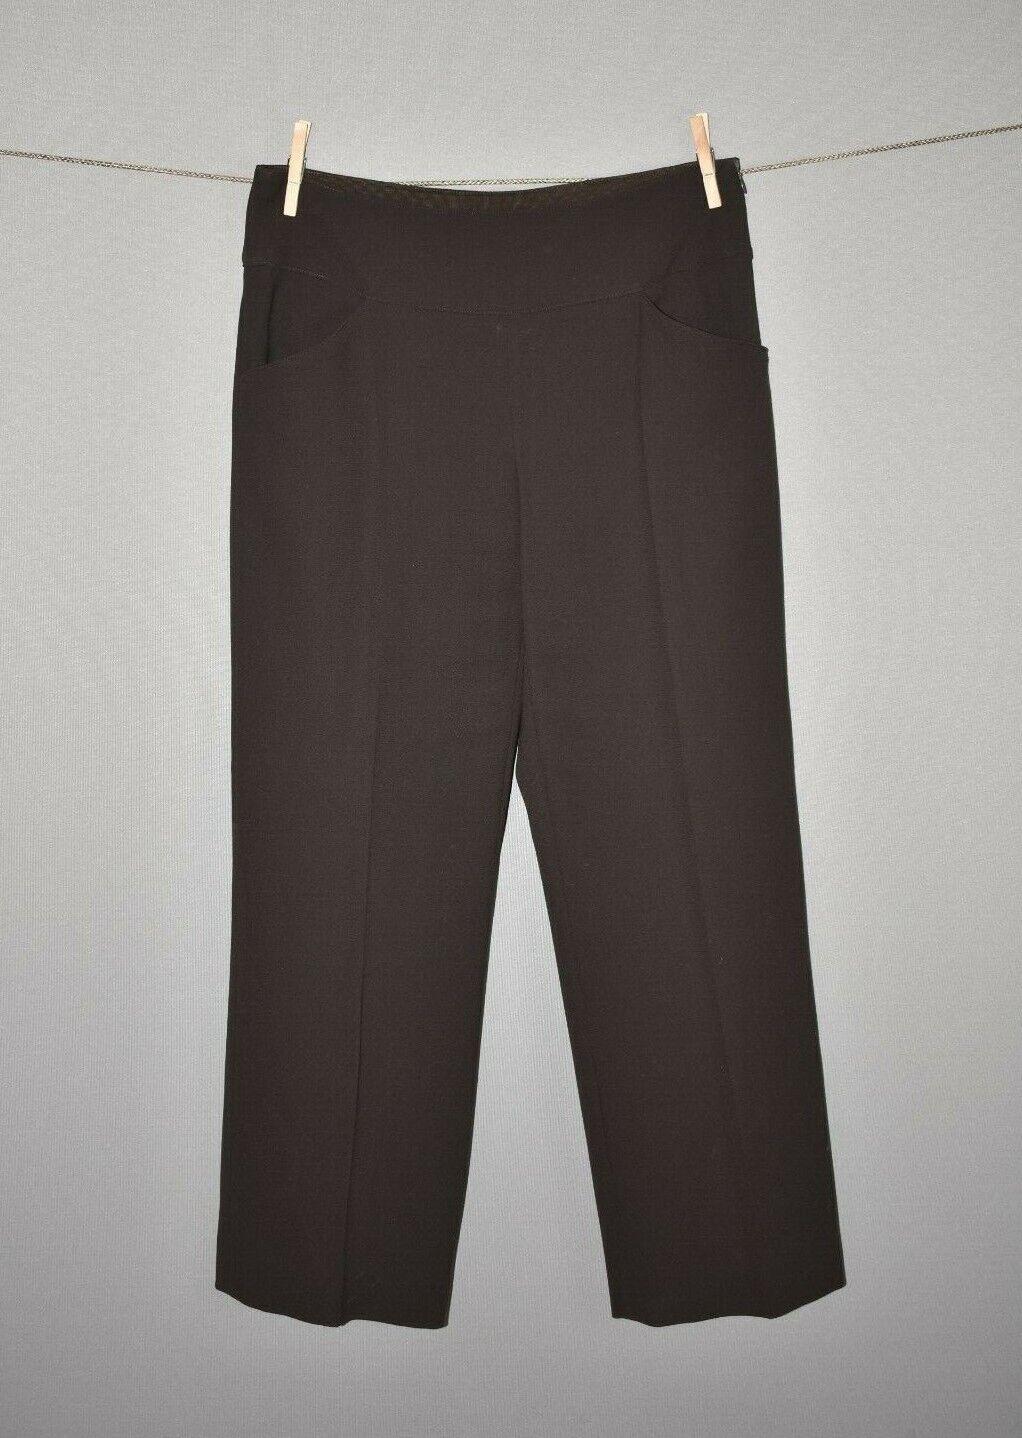 ARMANI COLLEZIONI  495 Brown Straight Leg Side Zip Wool Dress Pant Size 8